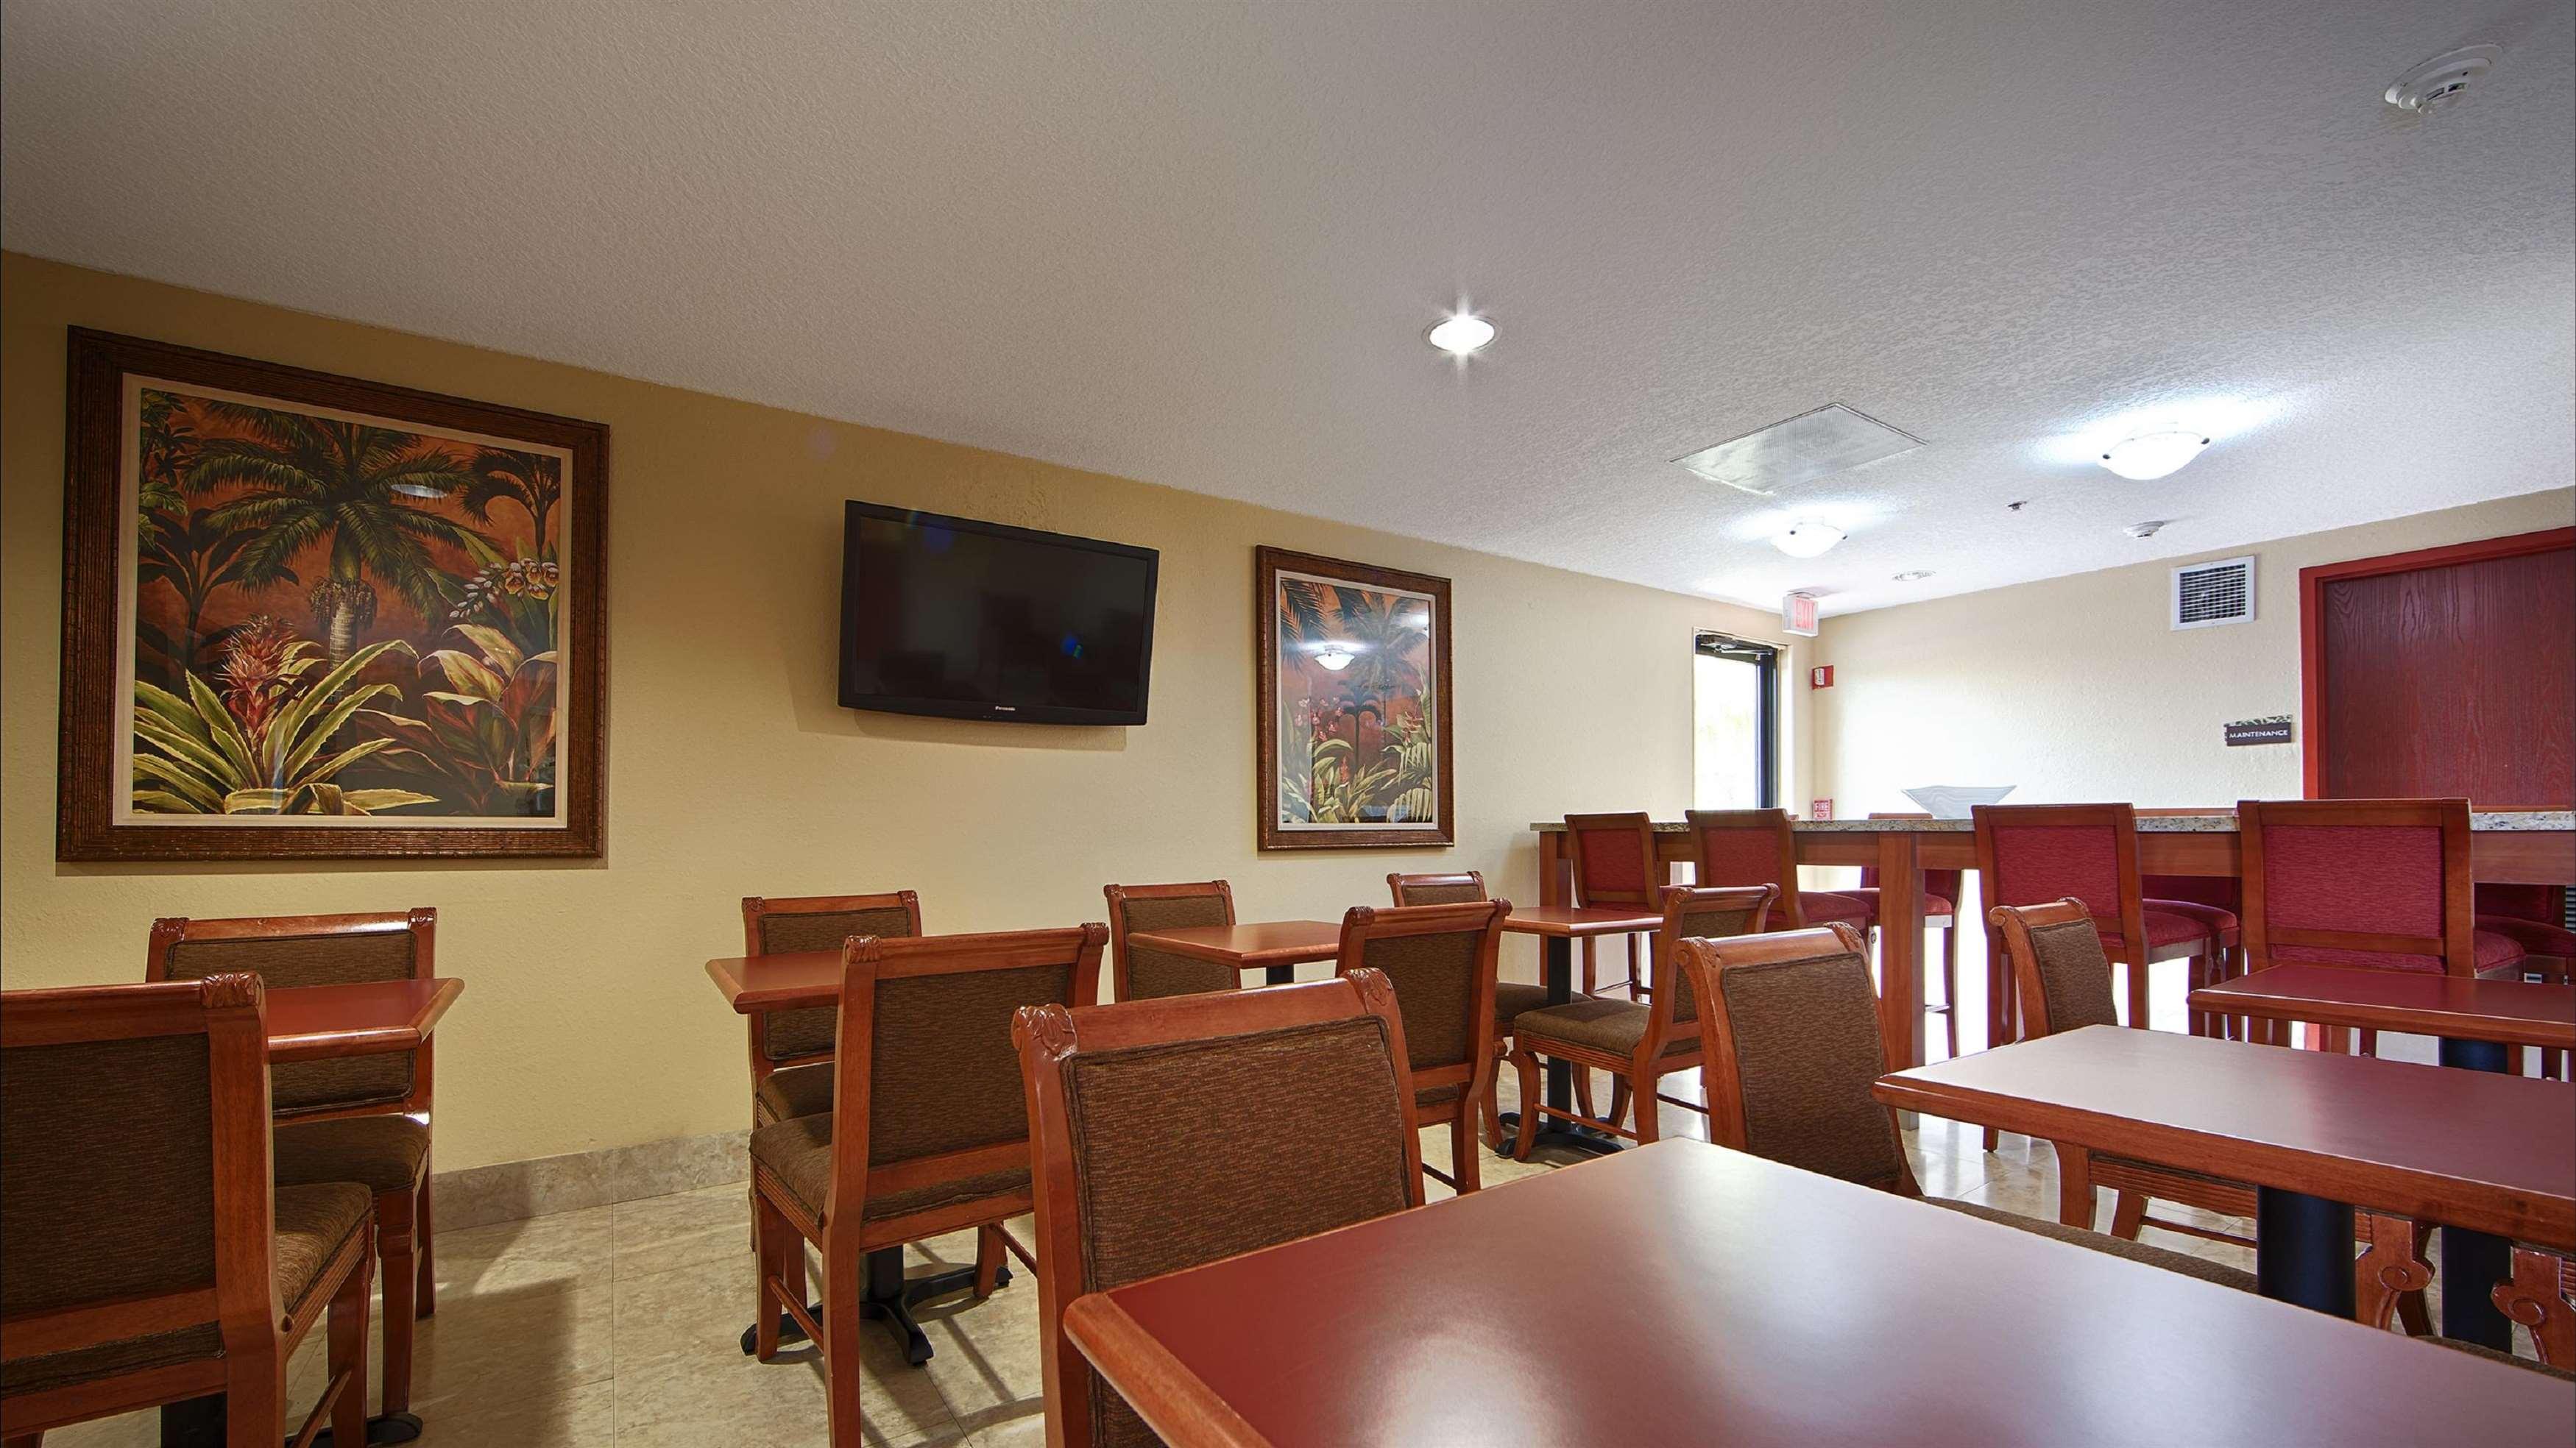 Best Restaurant In Fort Lauderdale Airport